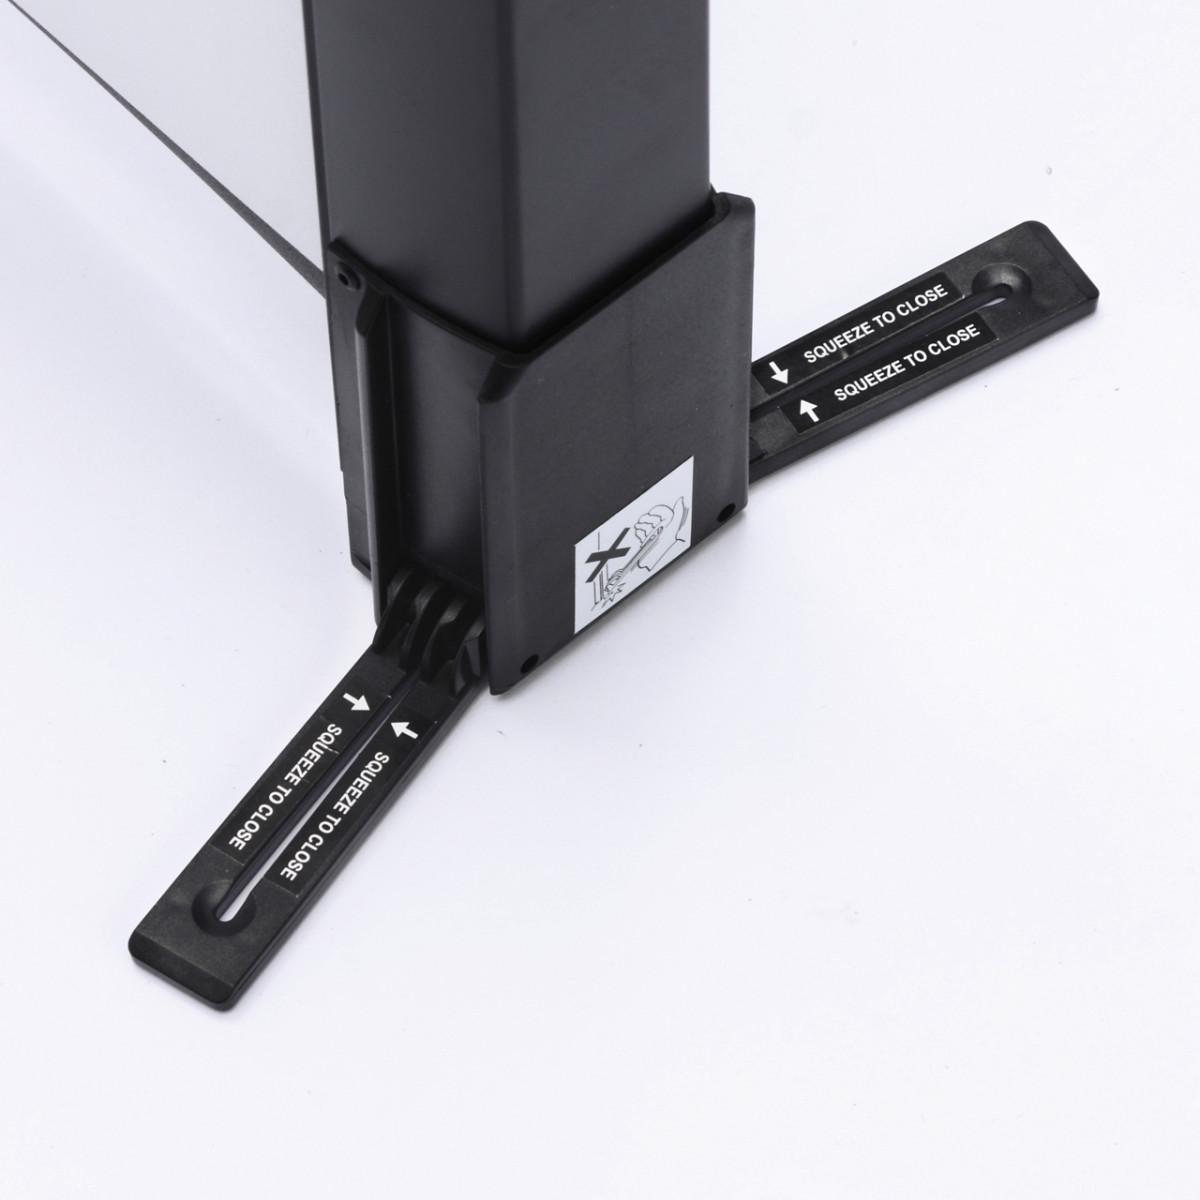 [PRS-M40] 【代引き不可】モバイルプロジェクタースクリーン 40型相当